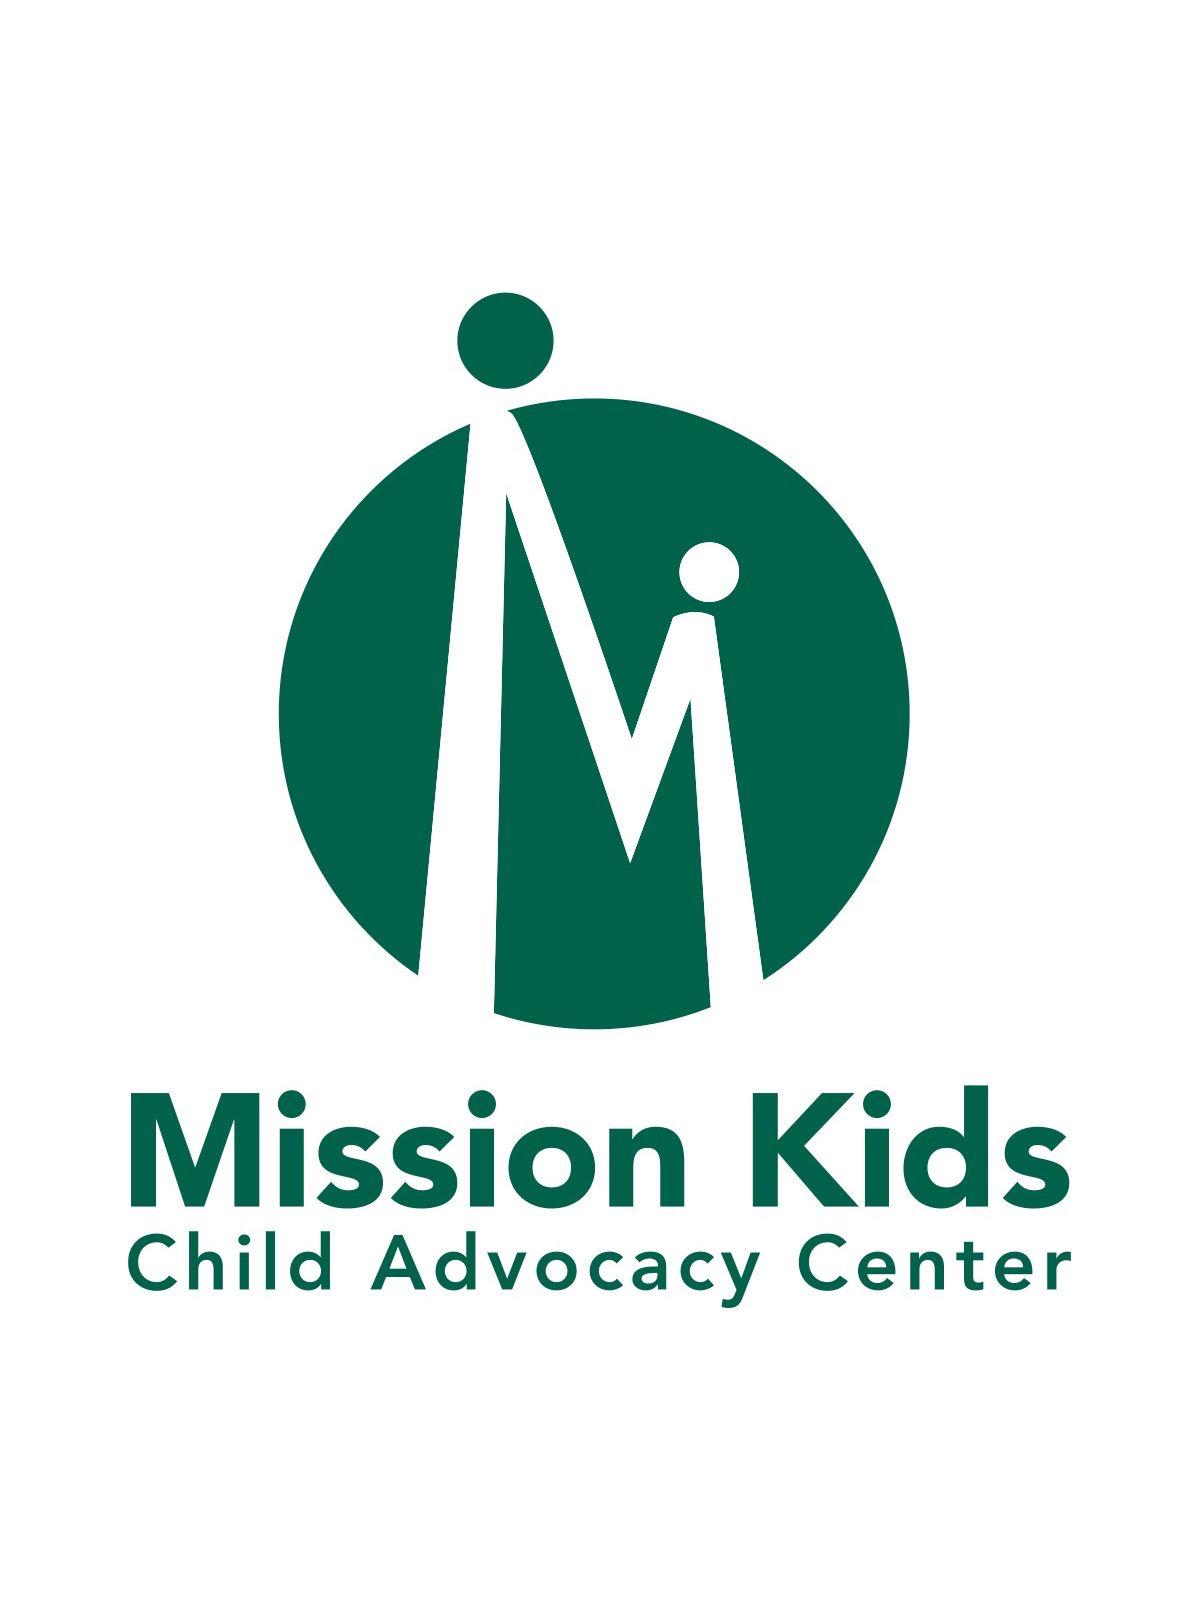 Mission Kids Child Advocacy Center